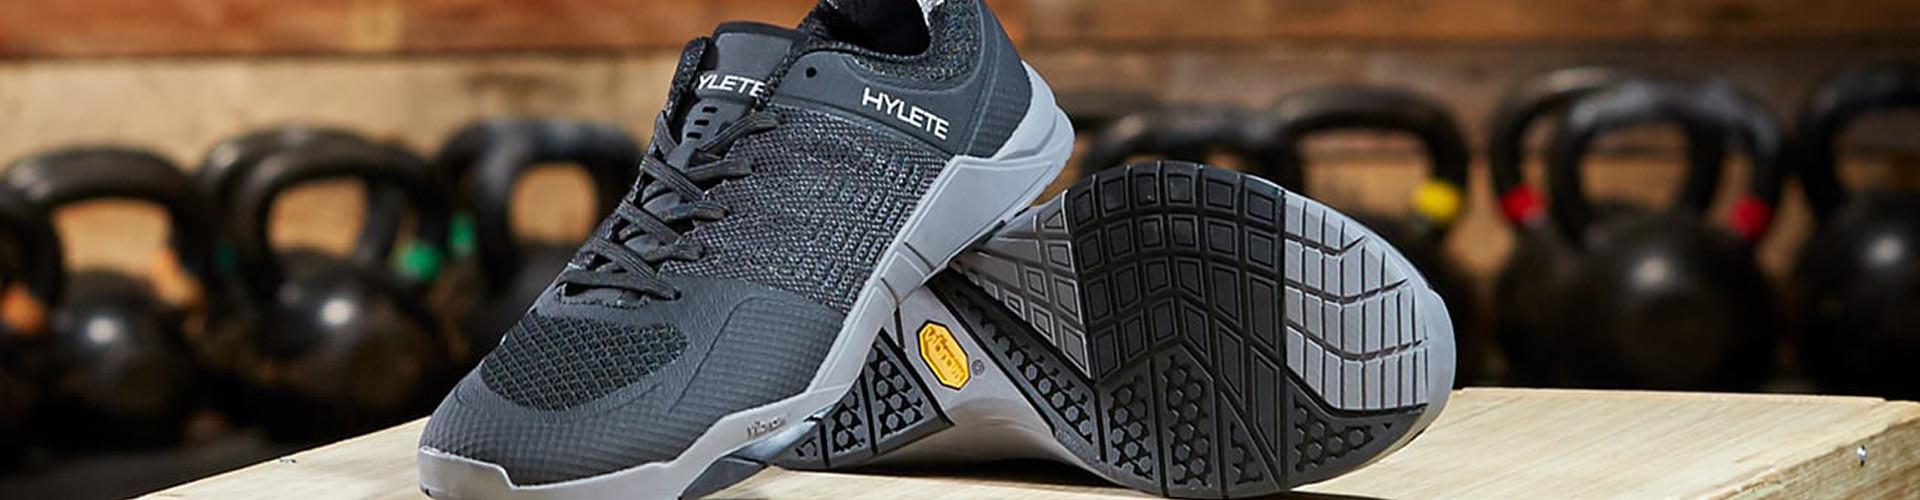 HYLETE's cross-training shoe will make you feel like an athlete